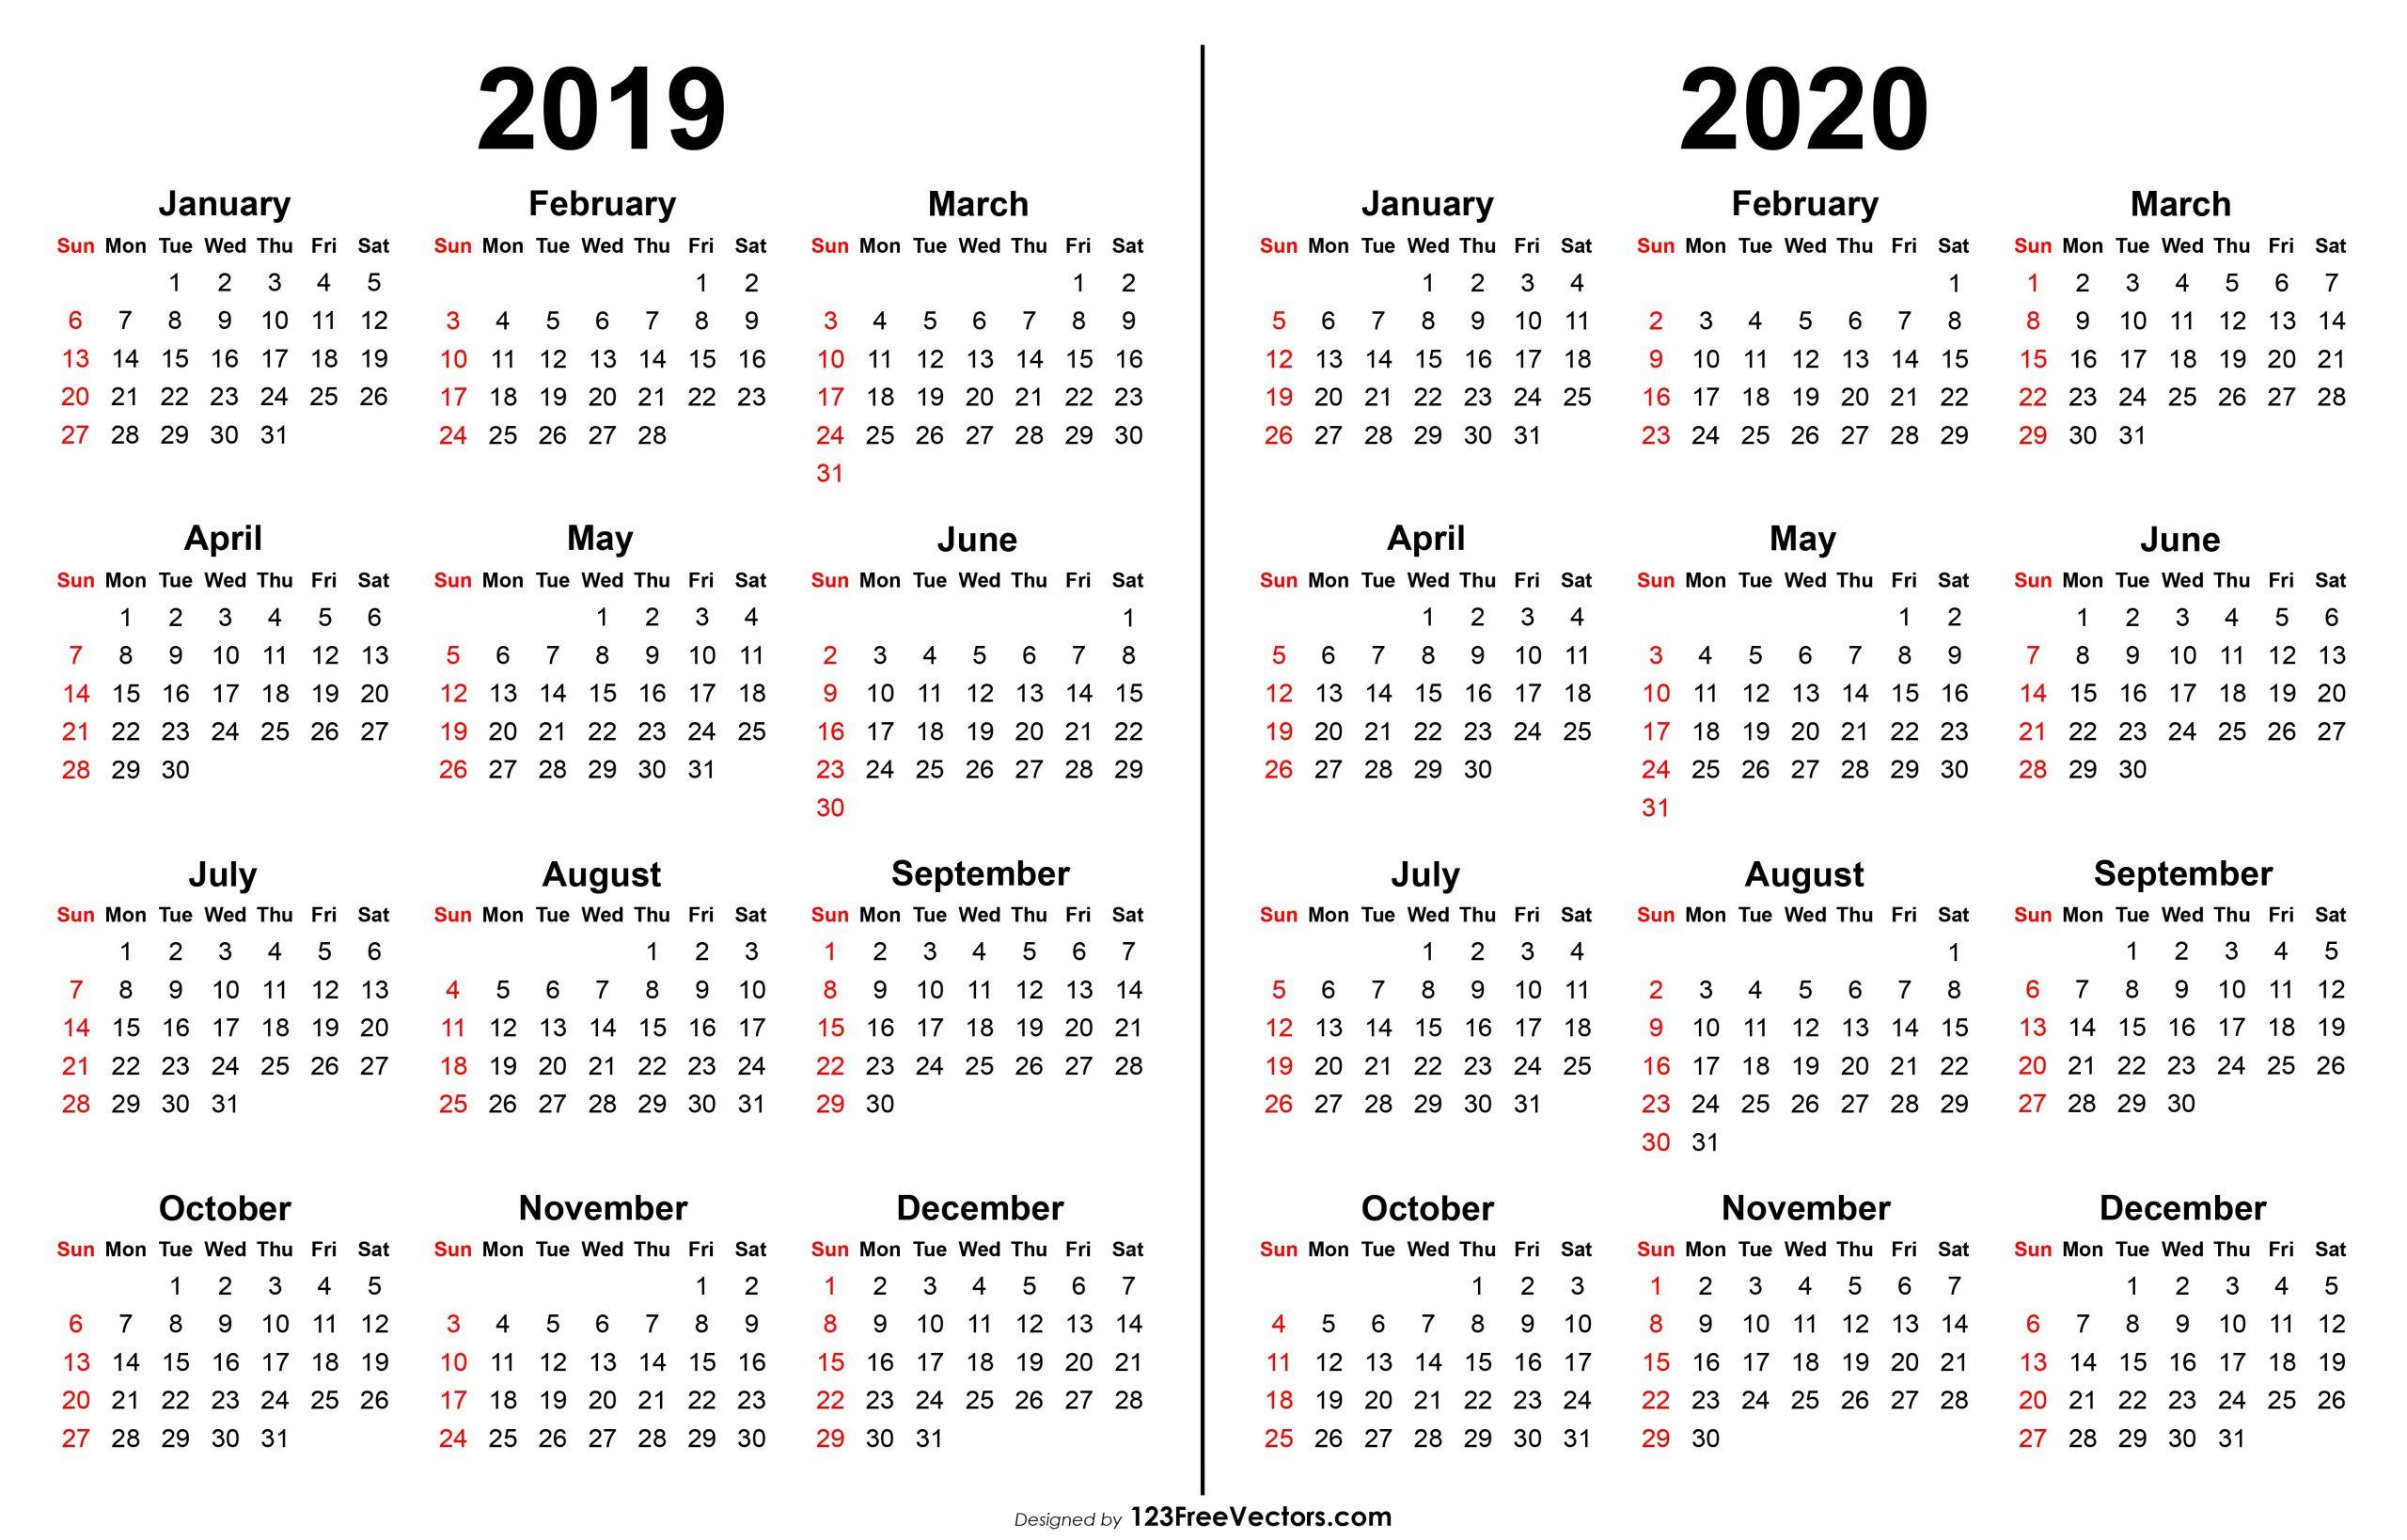 2019 2020 Calendar | Printable Yearly Calendar, Print